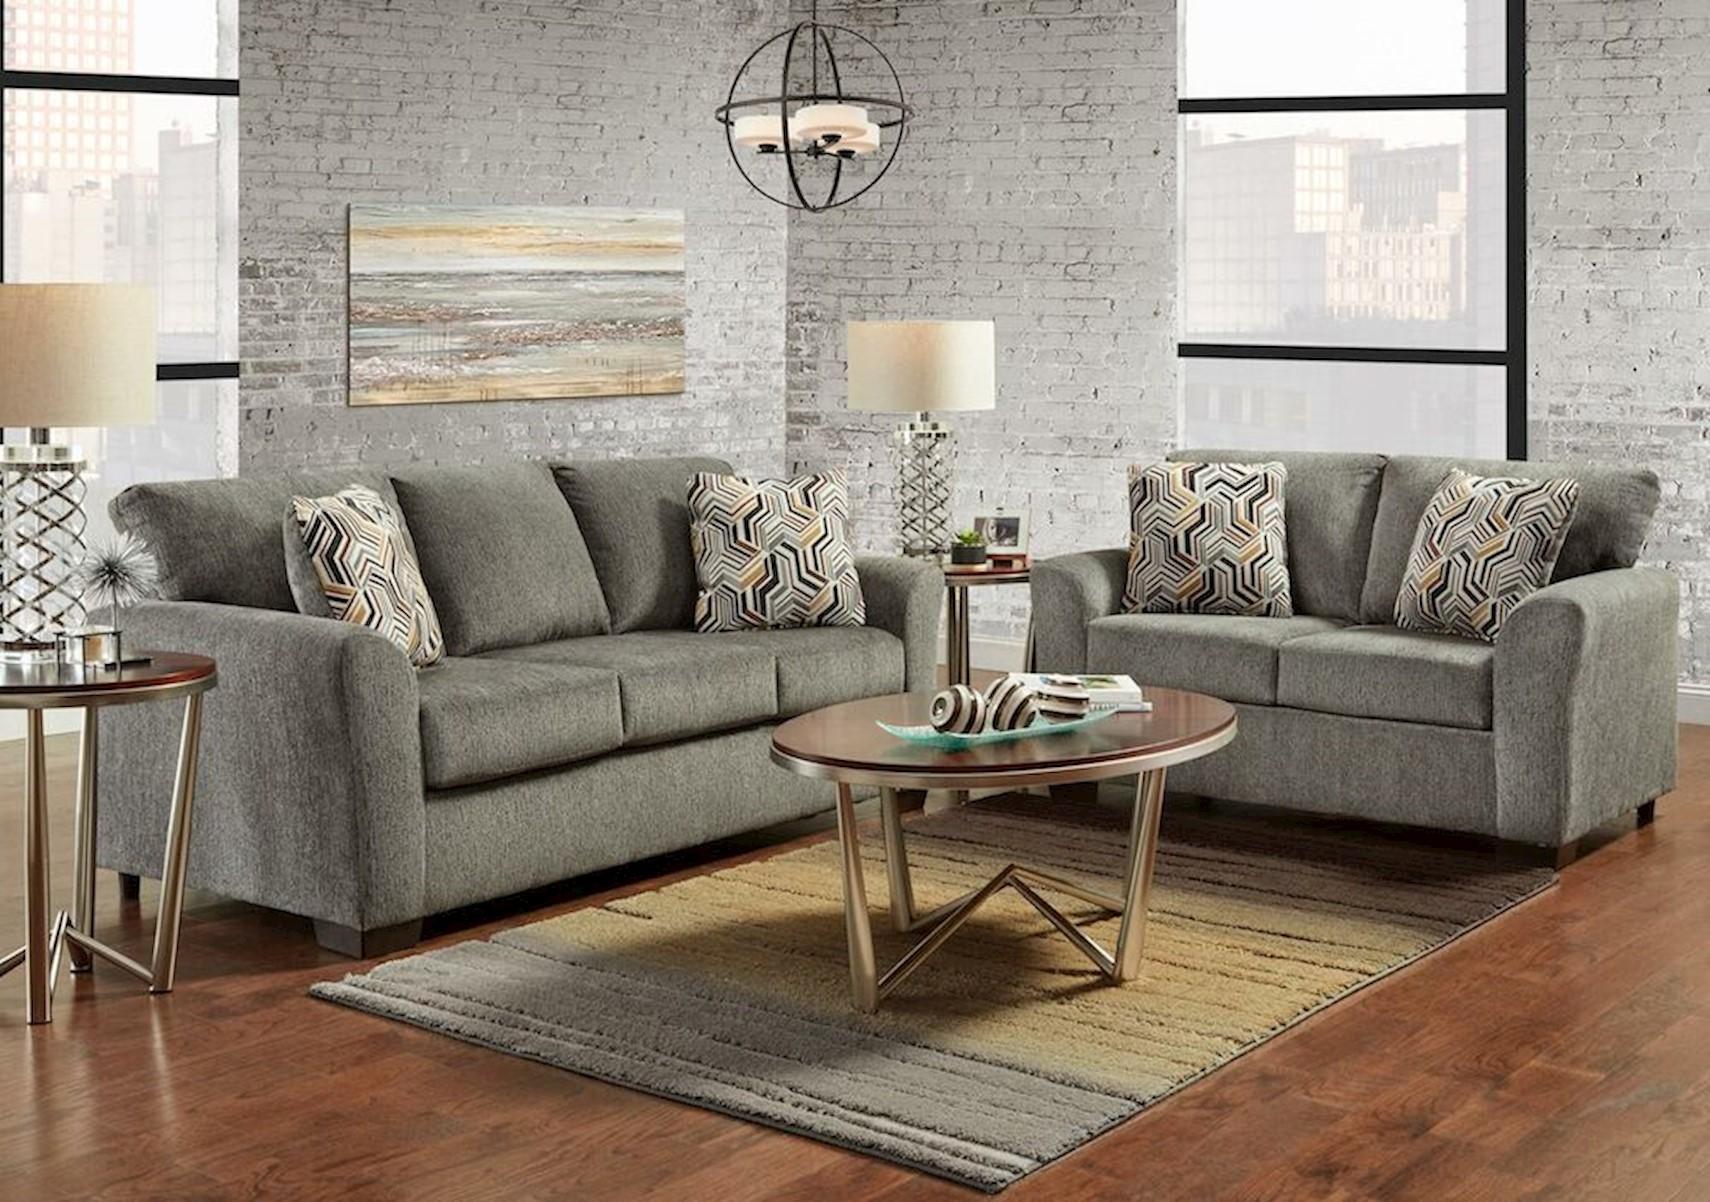 Lacks Cleburn Gray 2 Pc Living Room Set, Gray Living Rooms